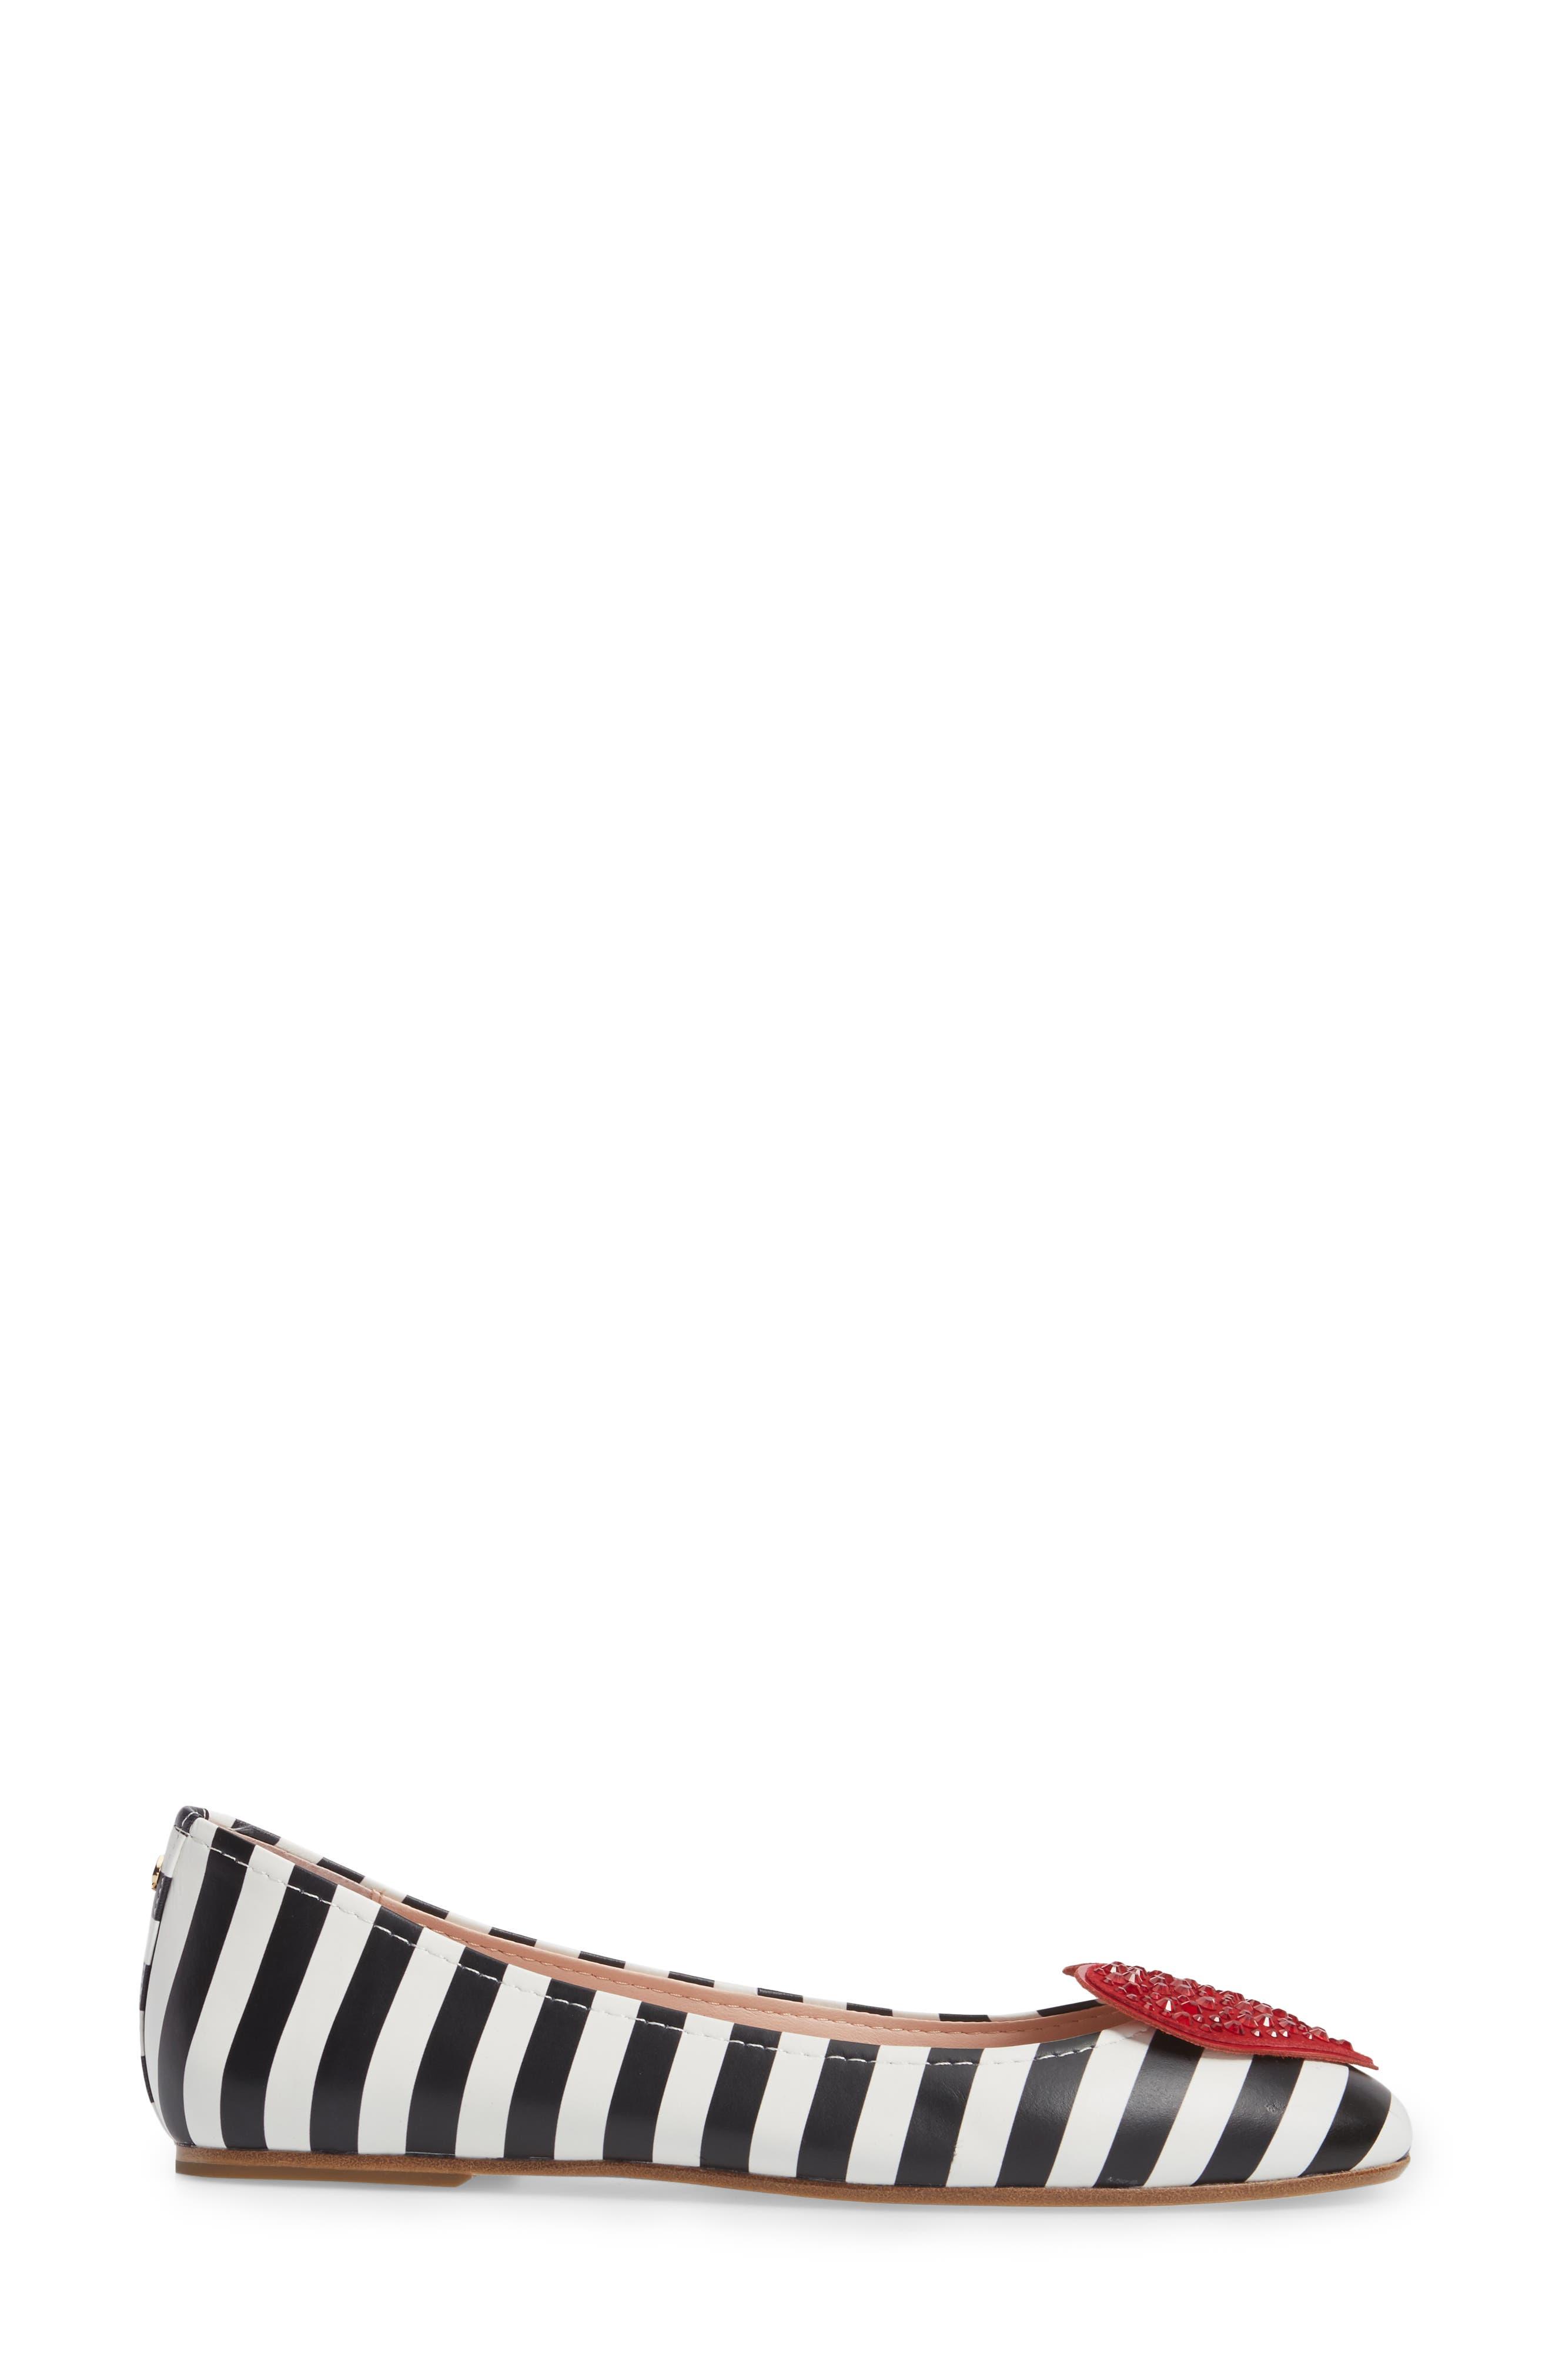 kade crystal embellished heart ballet flat,                             Alternate thumbnail 3, color,                             Black/ White Striped Nappa